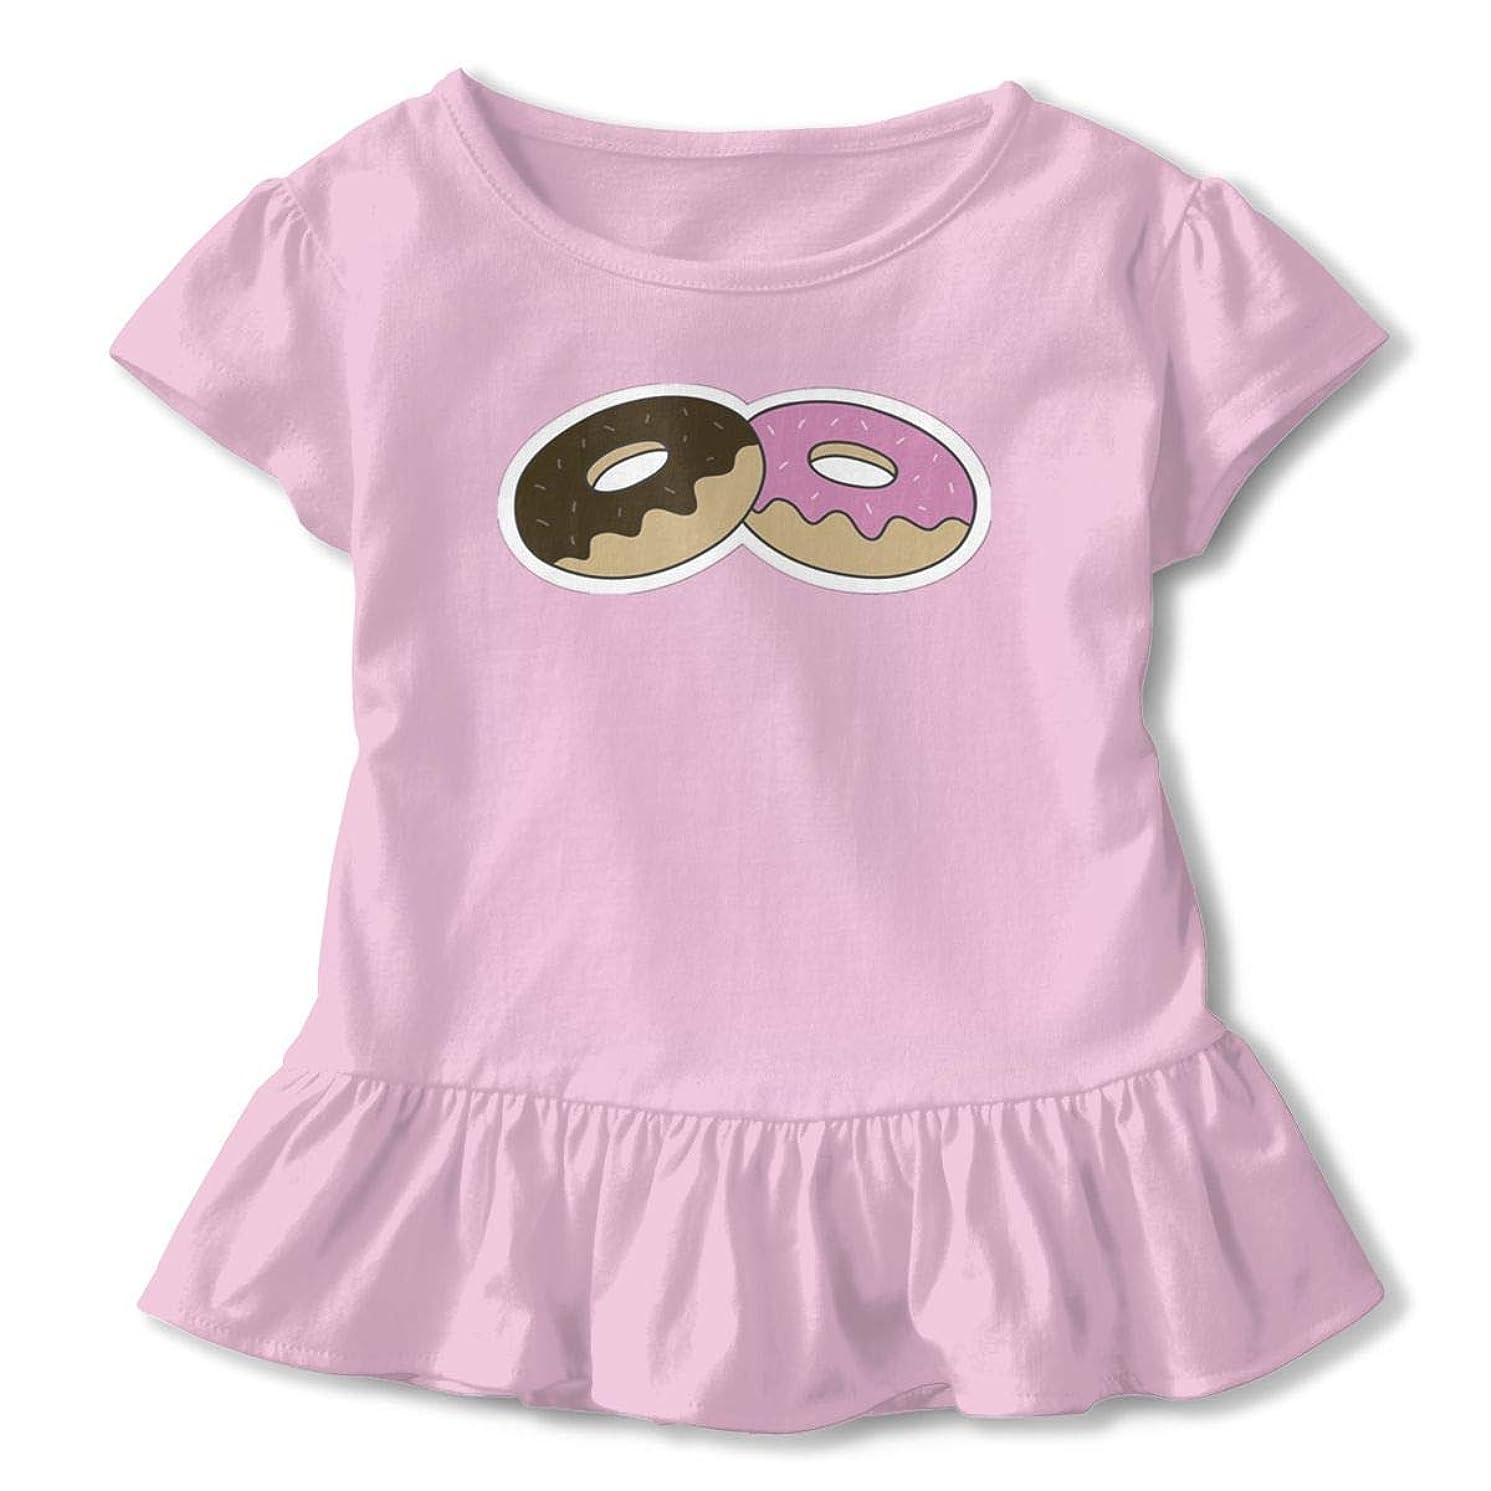 SDHEIJKY Donuts Girls Short Sleeved Shirt Cute Ruffle Top Girls Soft Basic T-Shirt, 2T-6T White